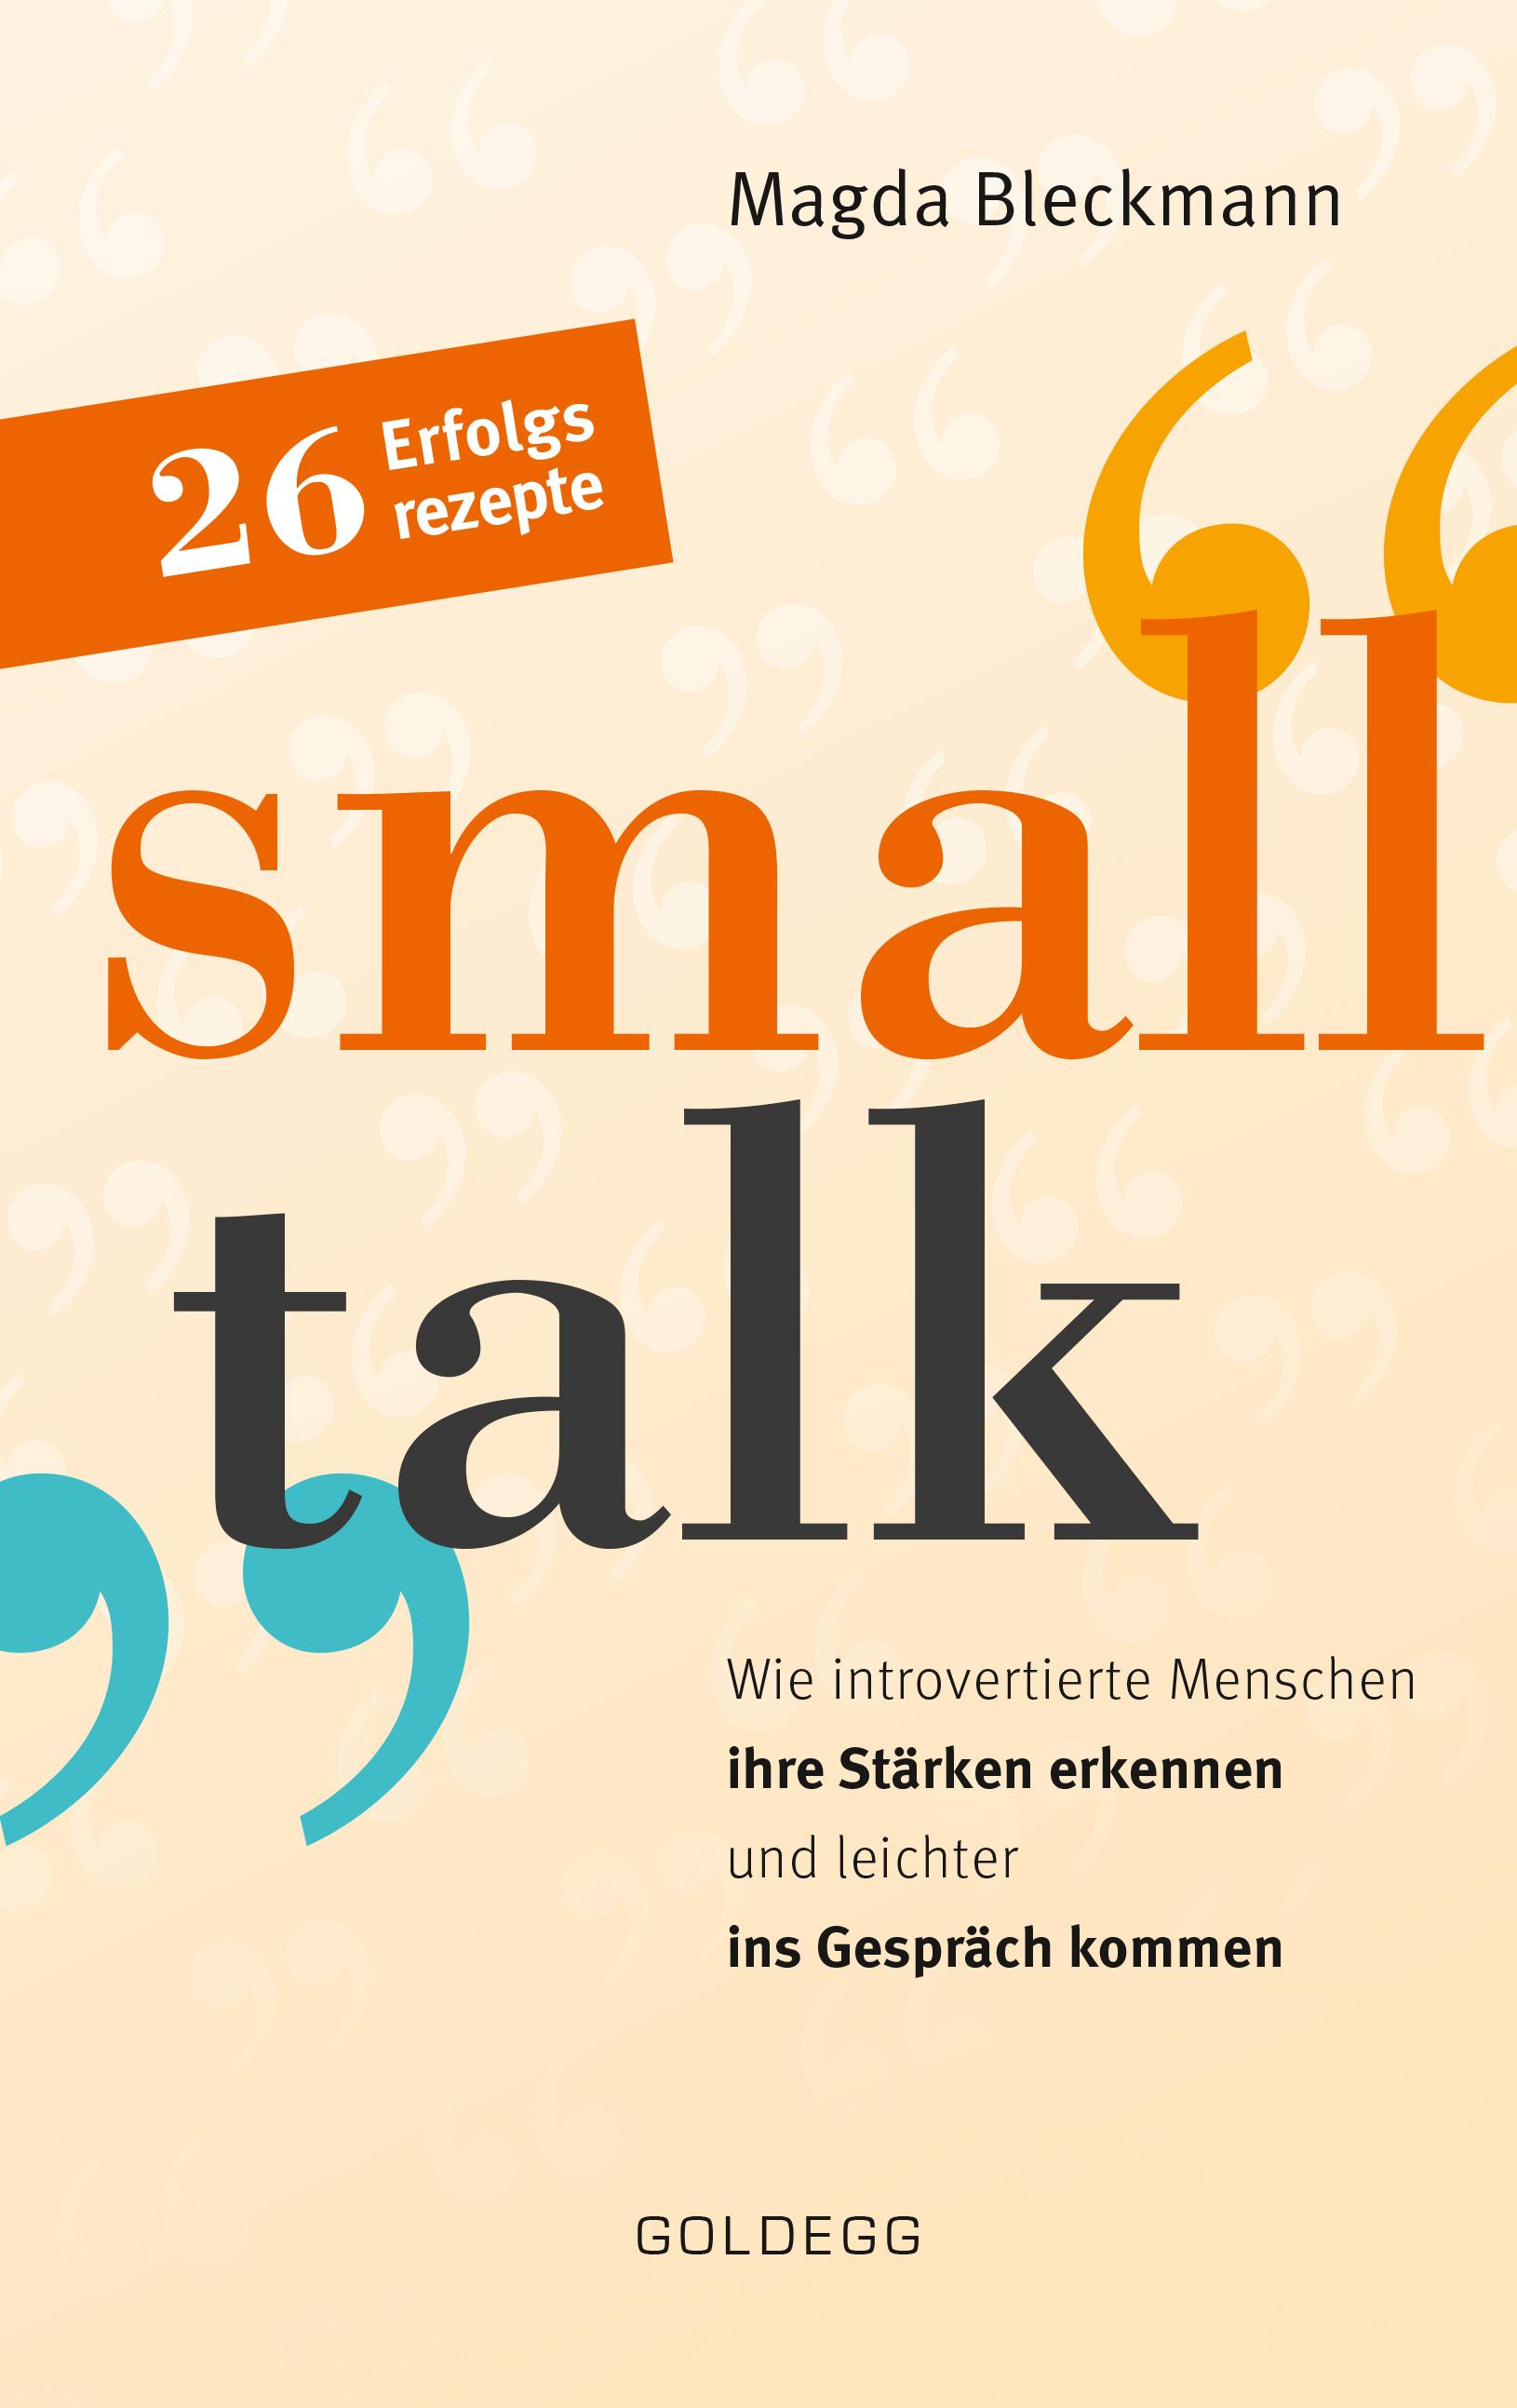 Smalltalk, Introvertierte, Kommunikation, Gespräch, Talk, Seminar, Smalltalk lernen, Smalltalk Seminar